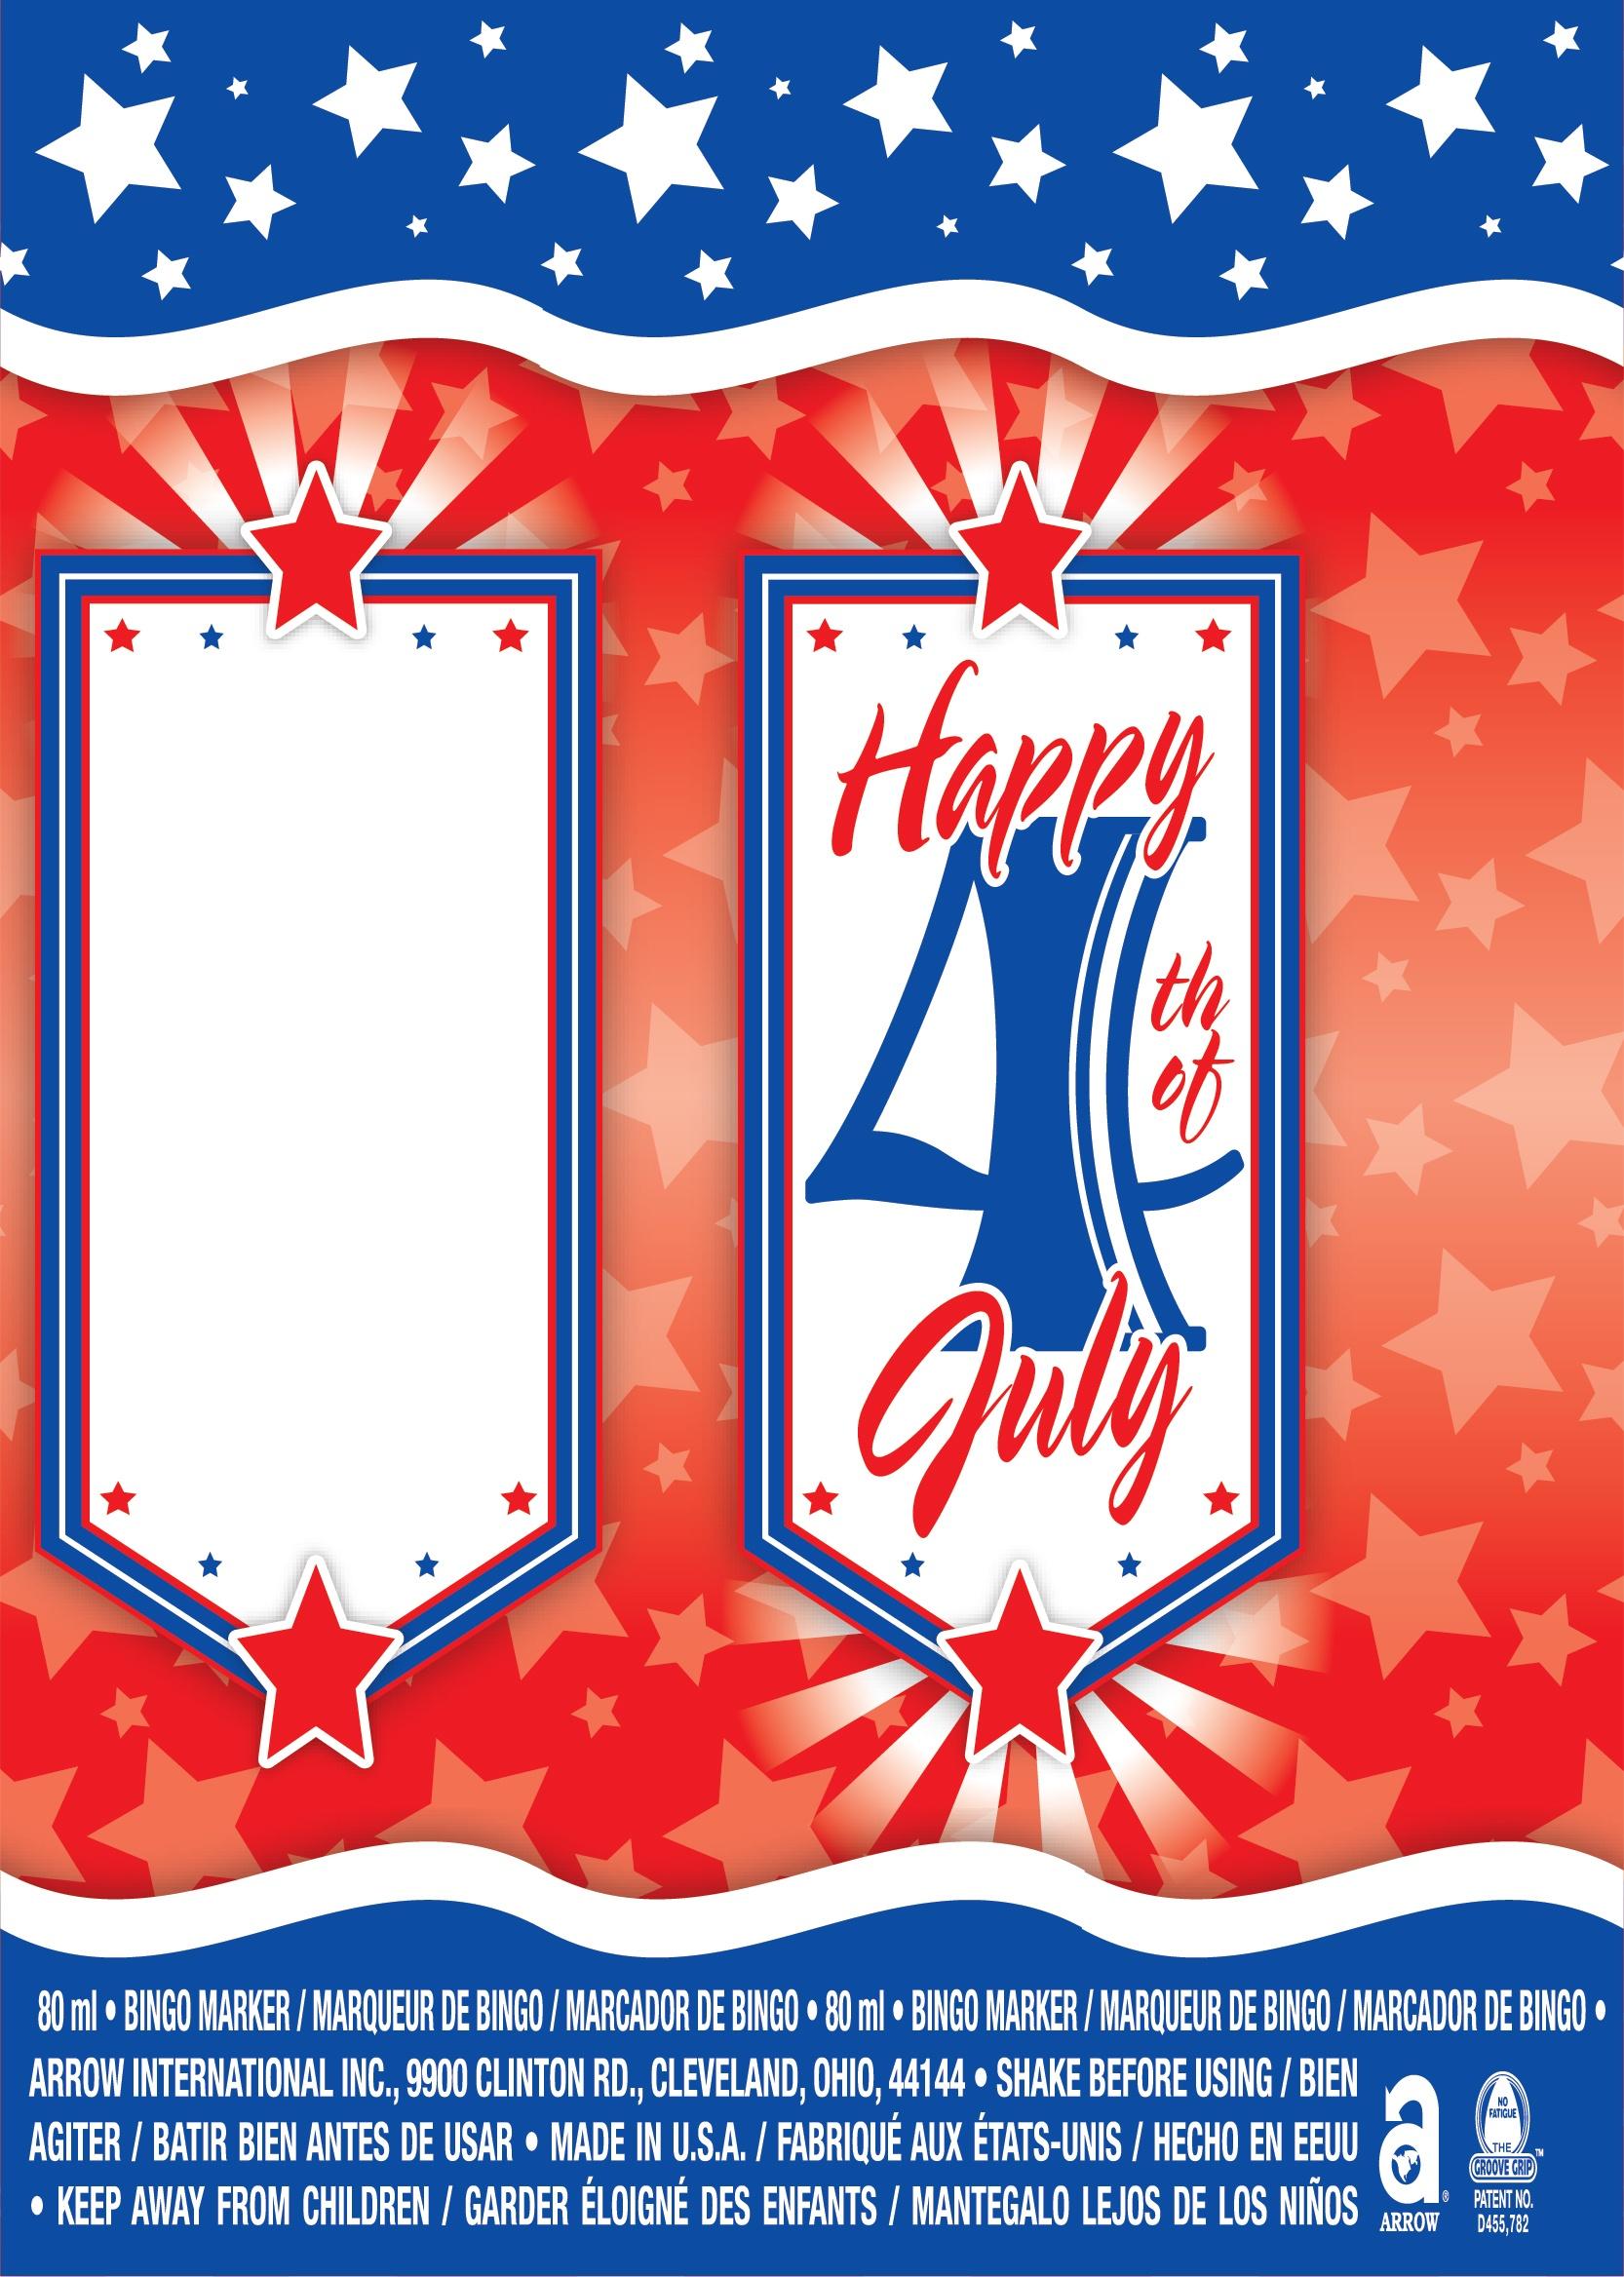 Happy 4th of July / Stars